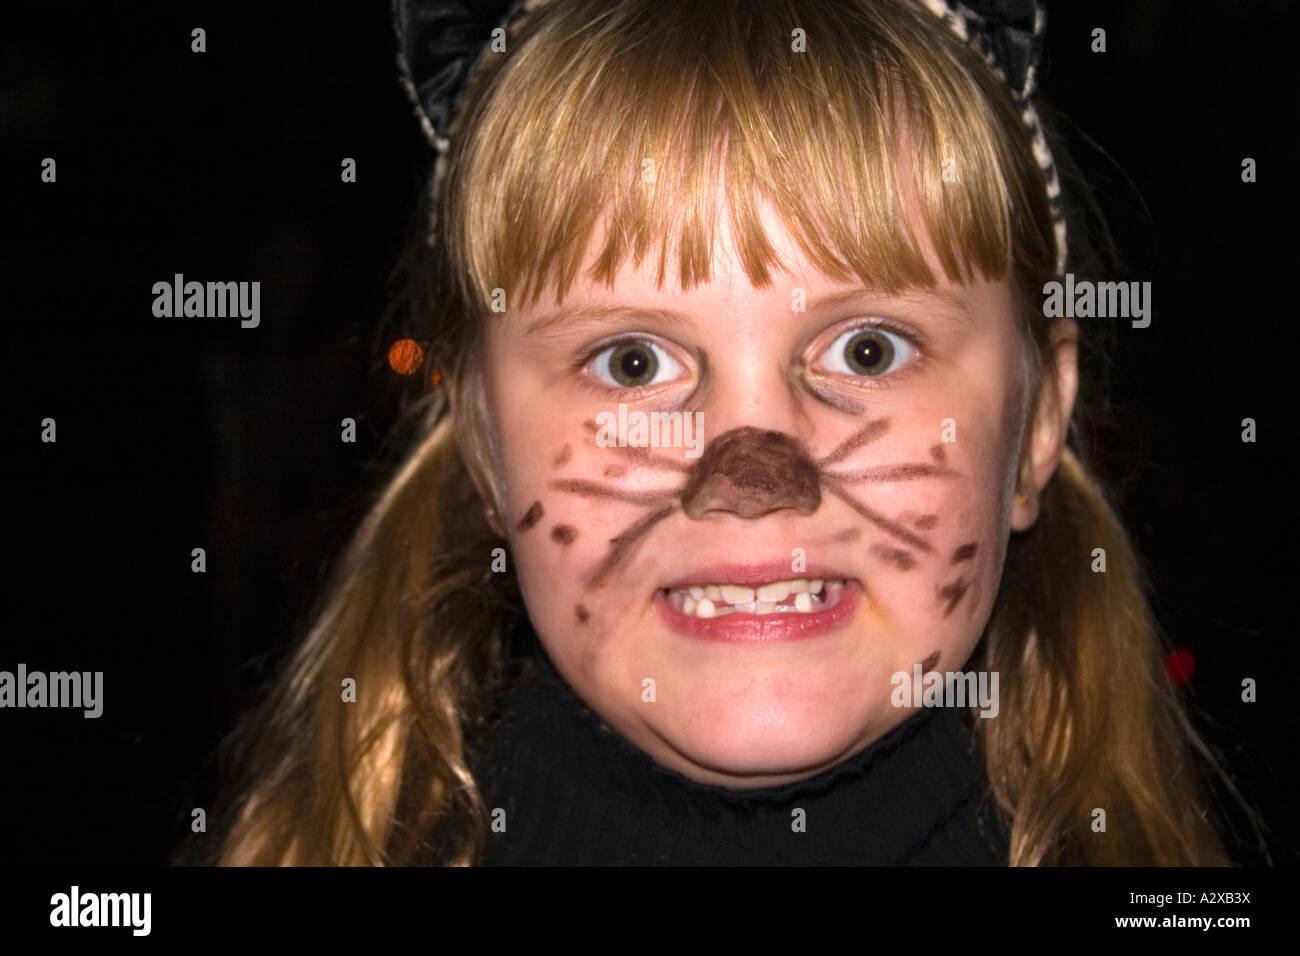 scary halloween cat face stock photos & scary halloween cat face